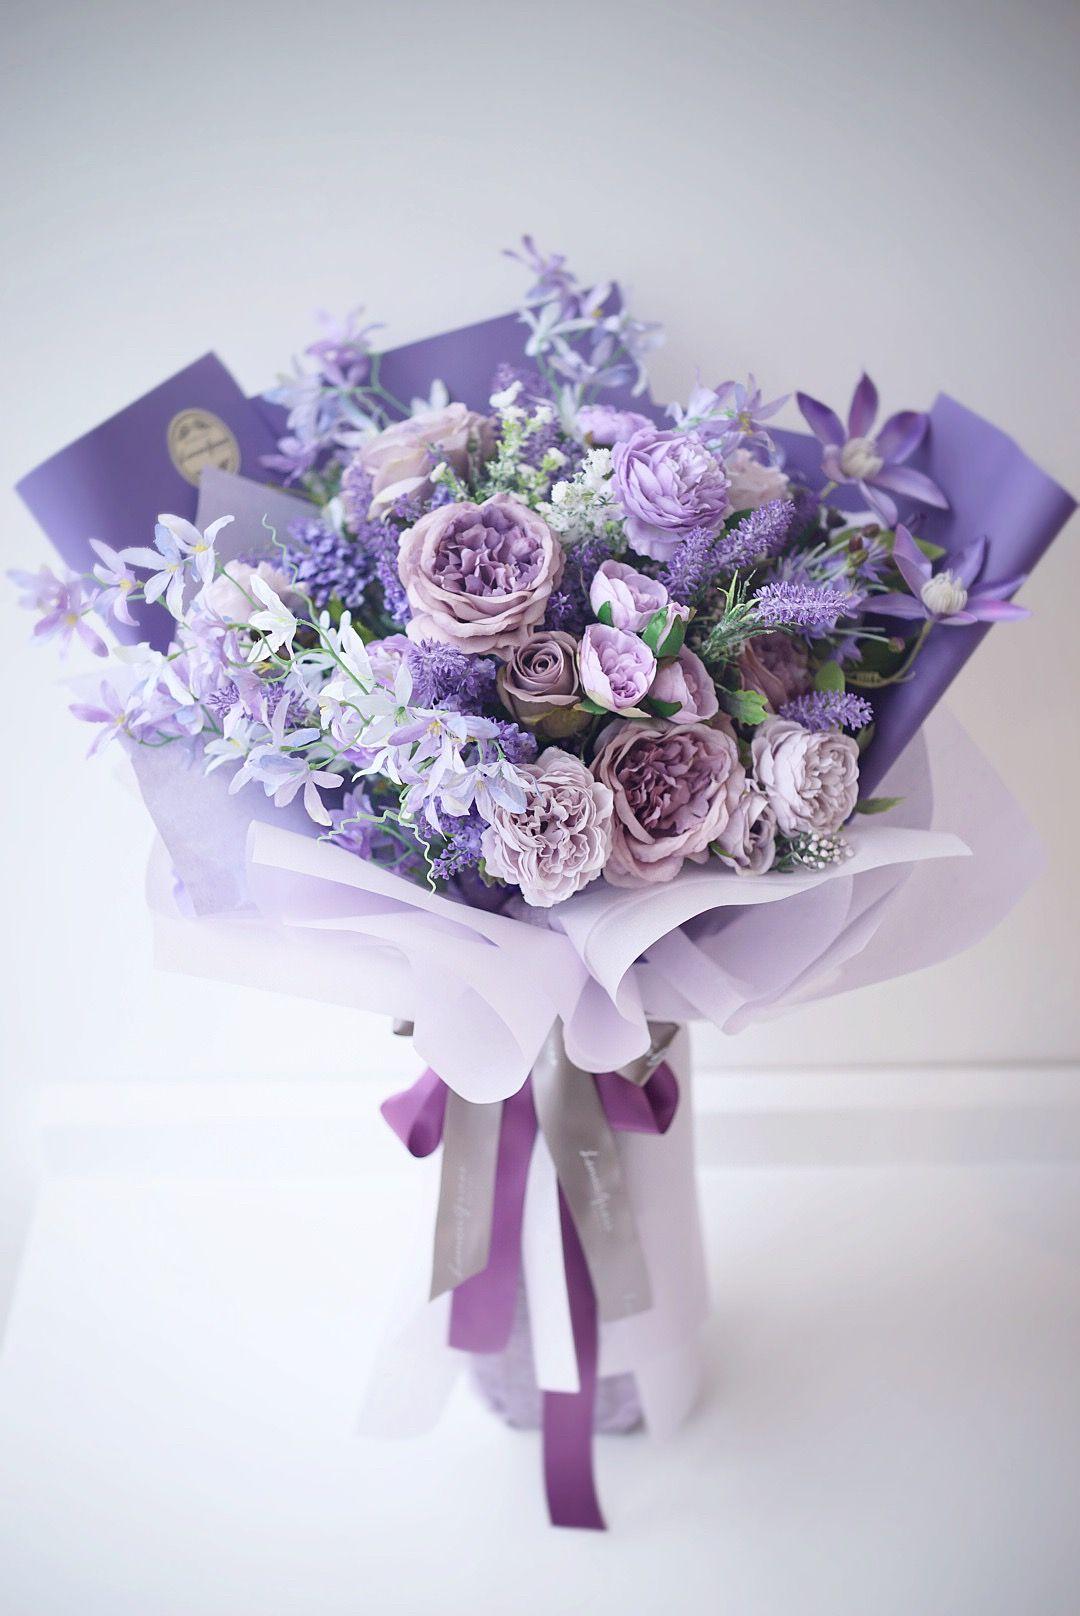 Pin Oleh Amy R Miller Di Silk Flower Gift Bouquet Mawar Ungu Bunga Ungu Toko Bunga